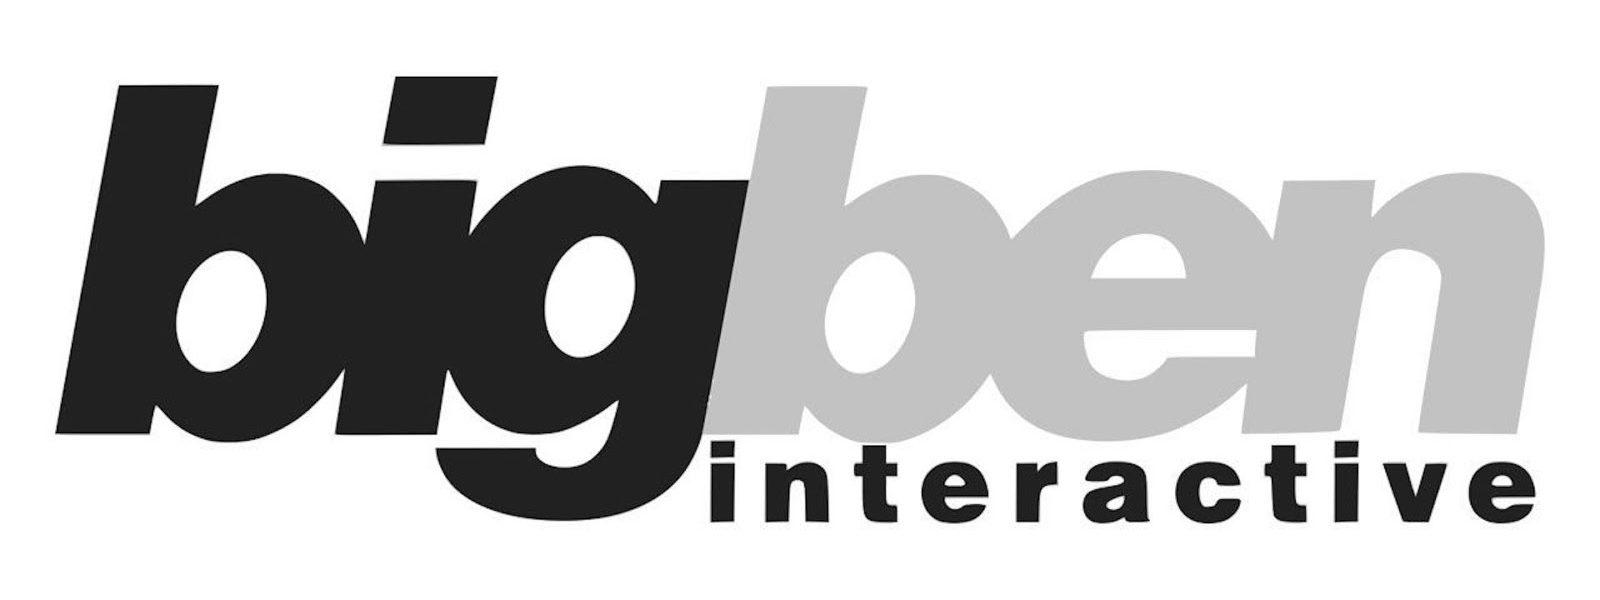 BigBen announces 3 epic exclusives